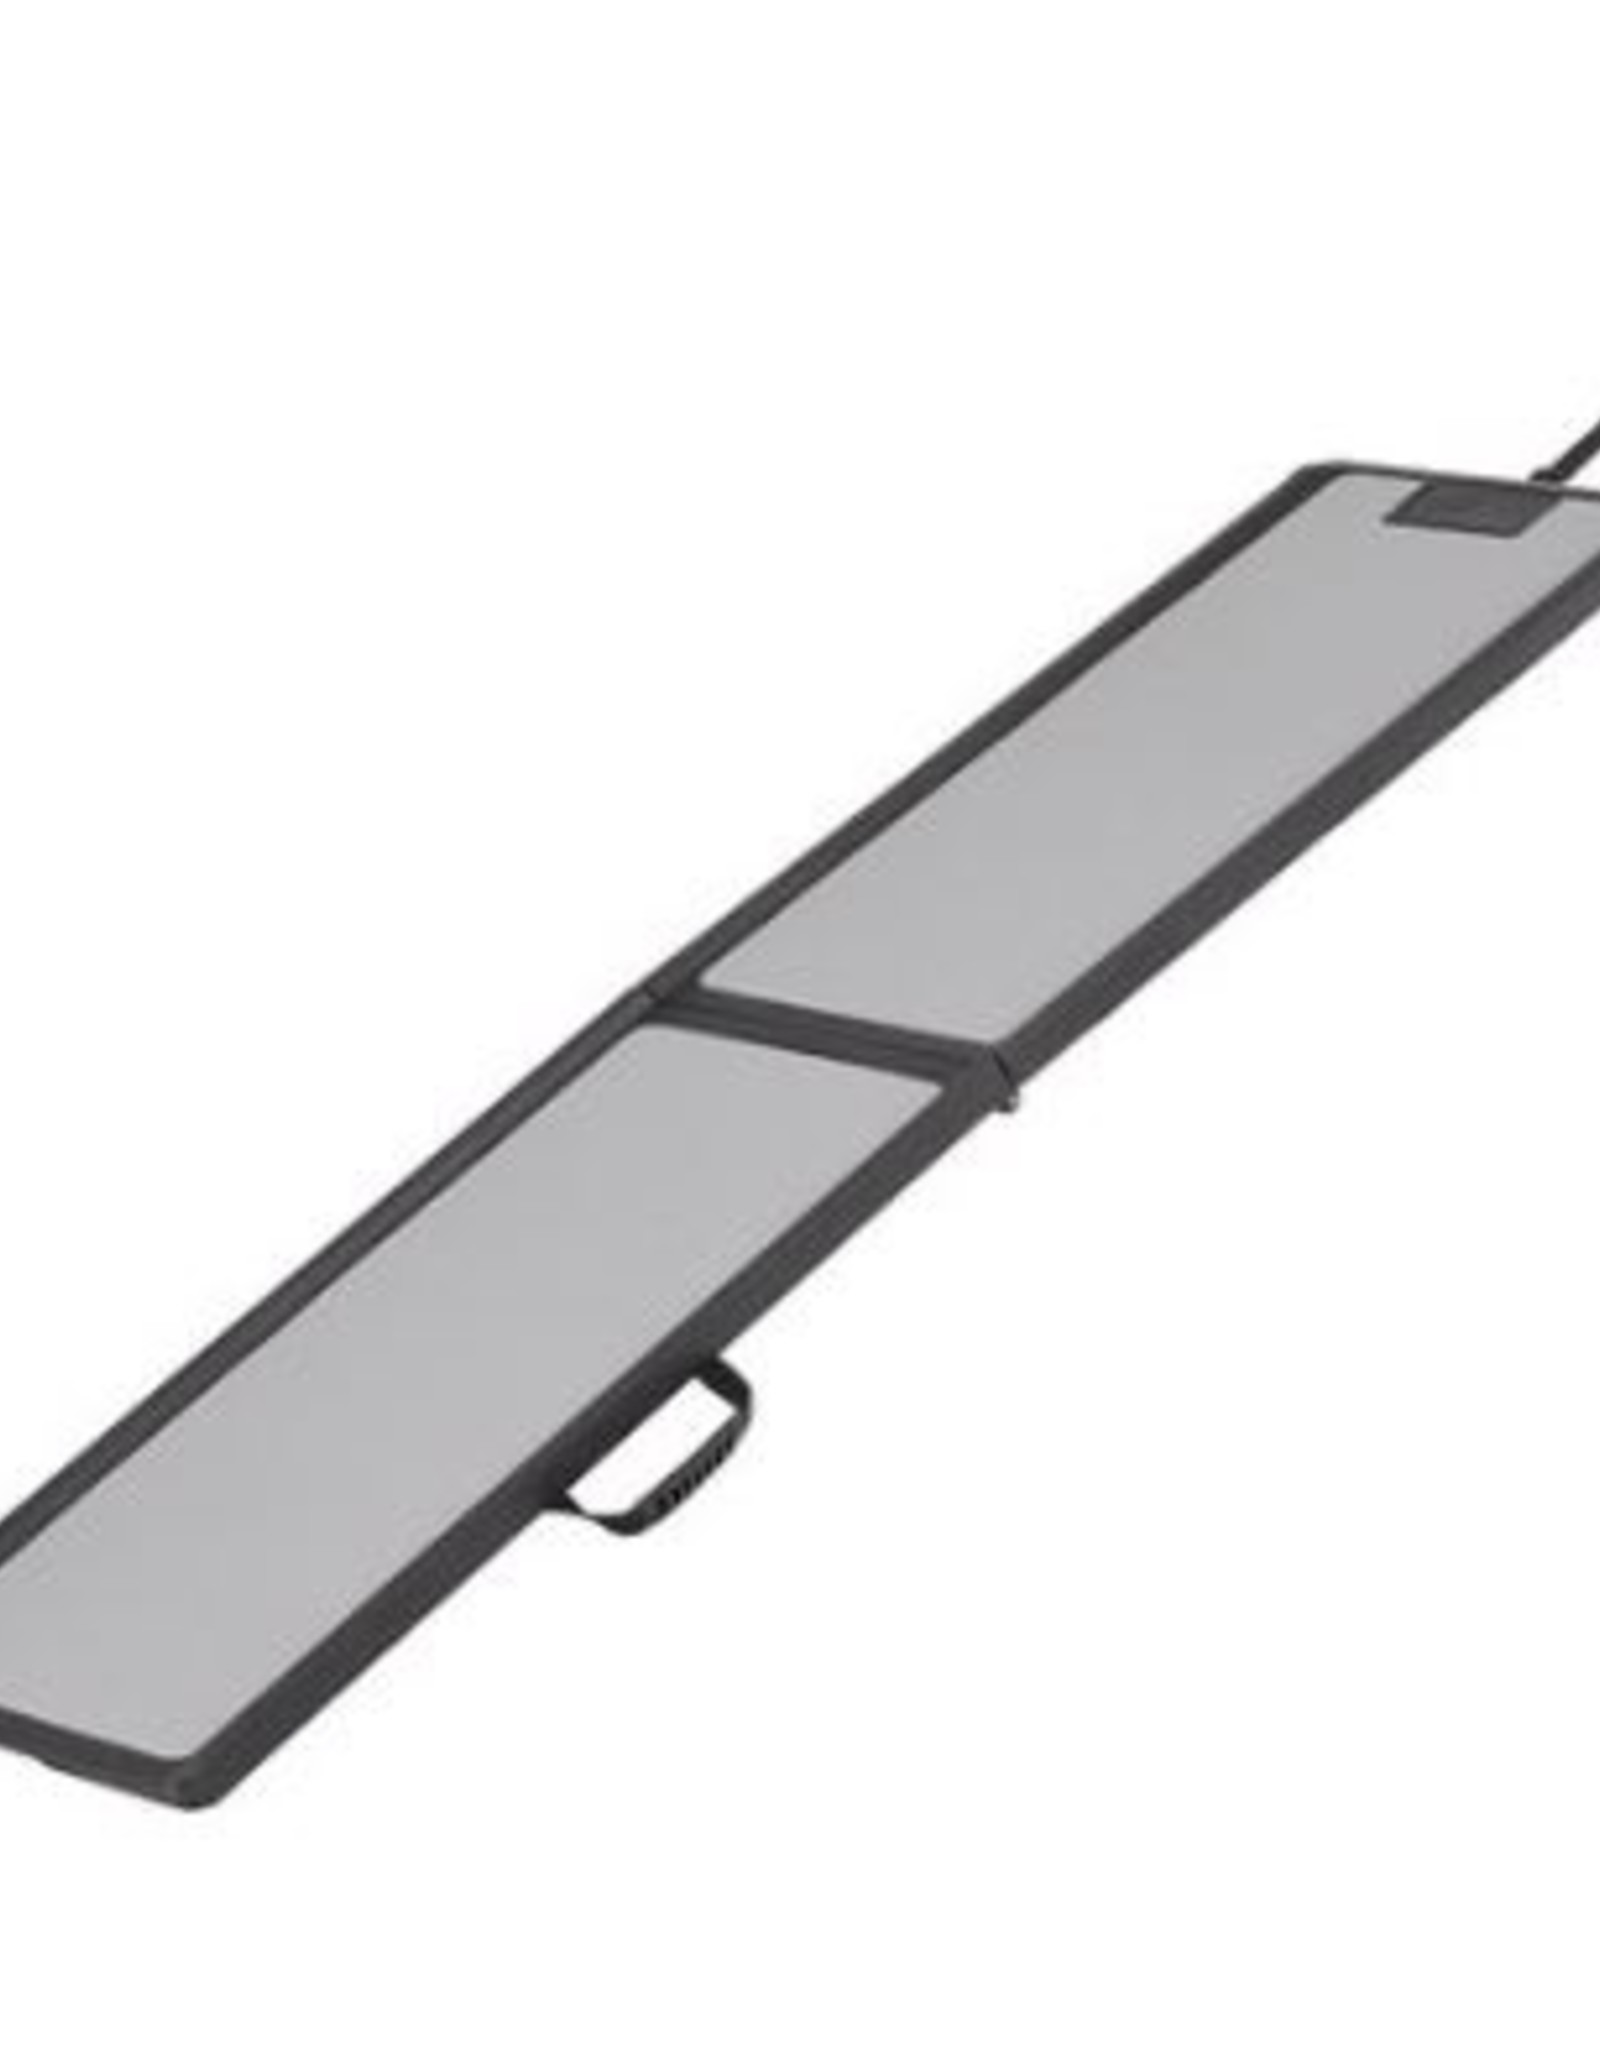 Gen7Pets Gen7Pets Feather-Lite Ramp for Dogs Grey 1ea/One Size